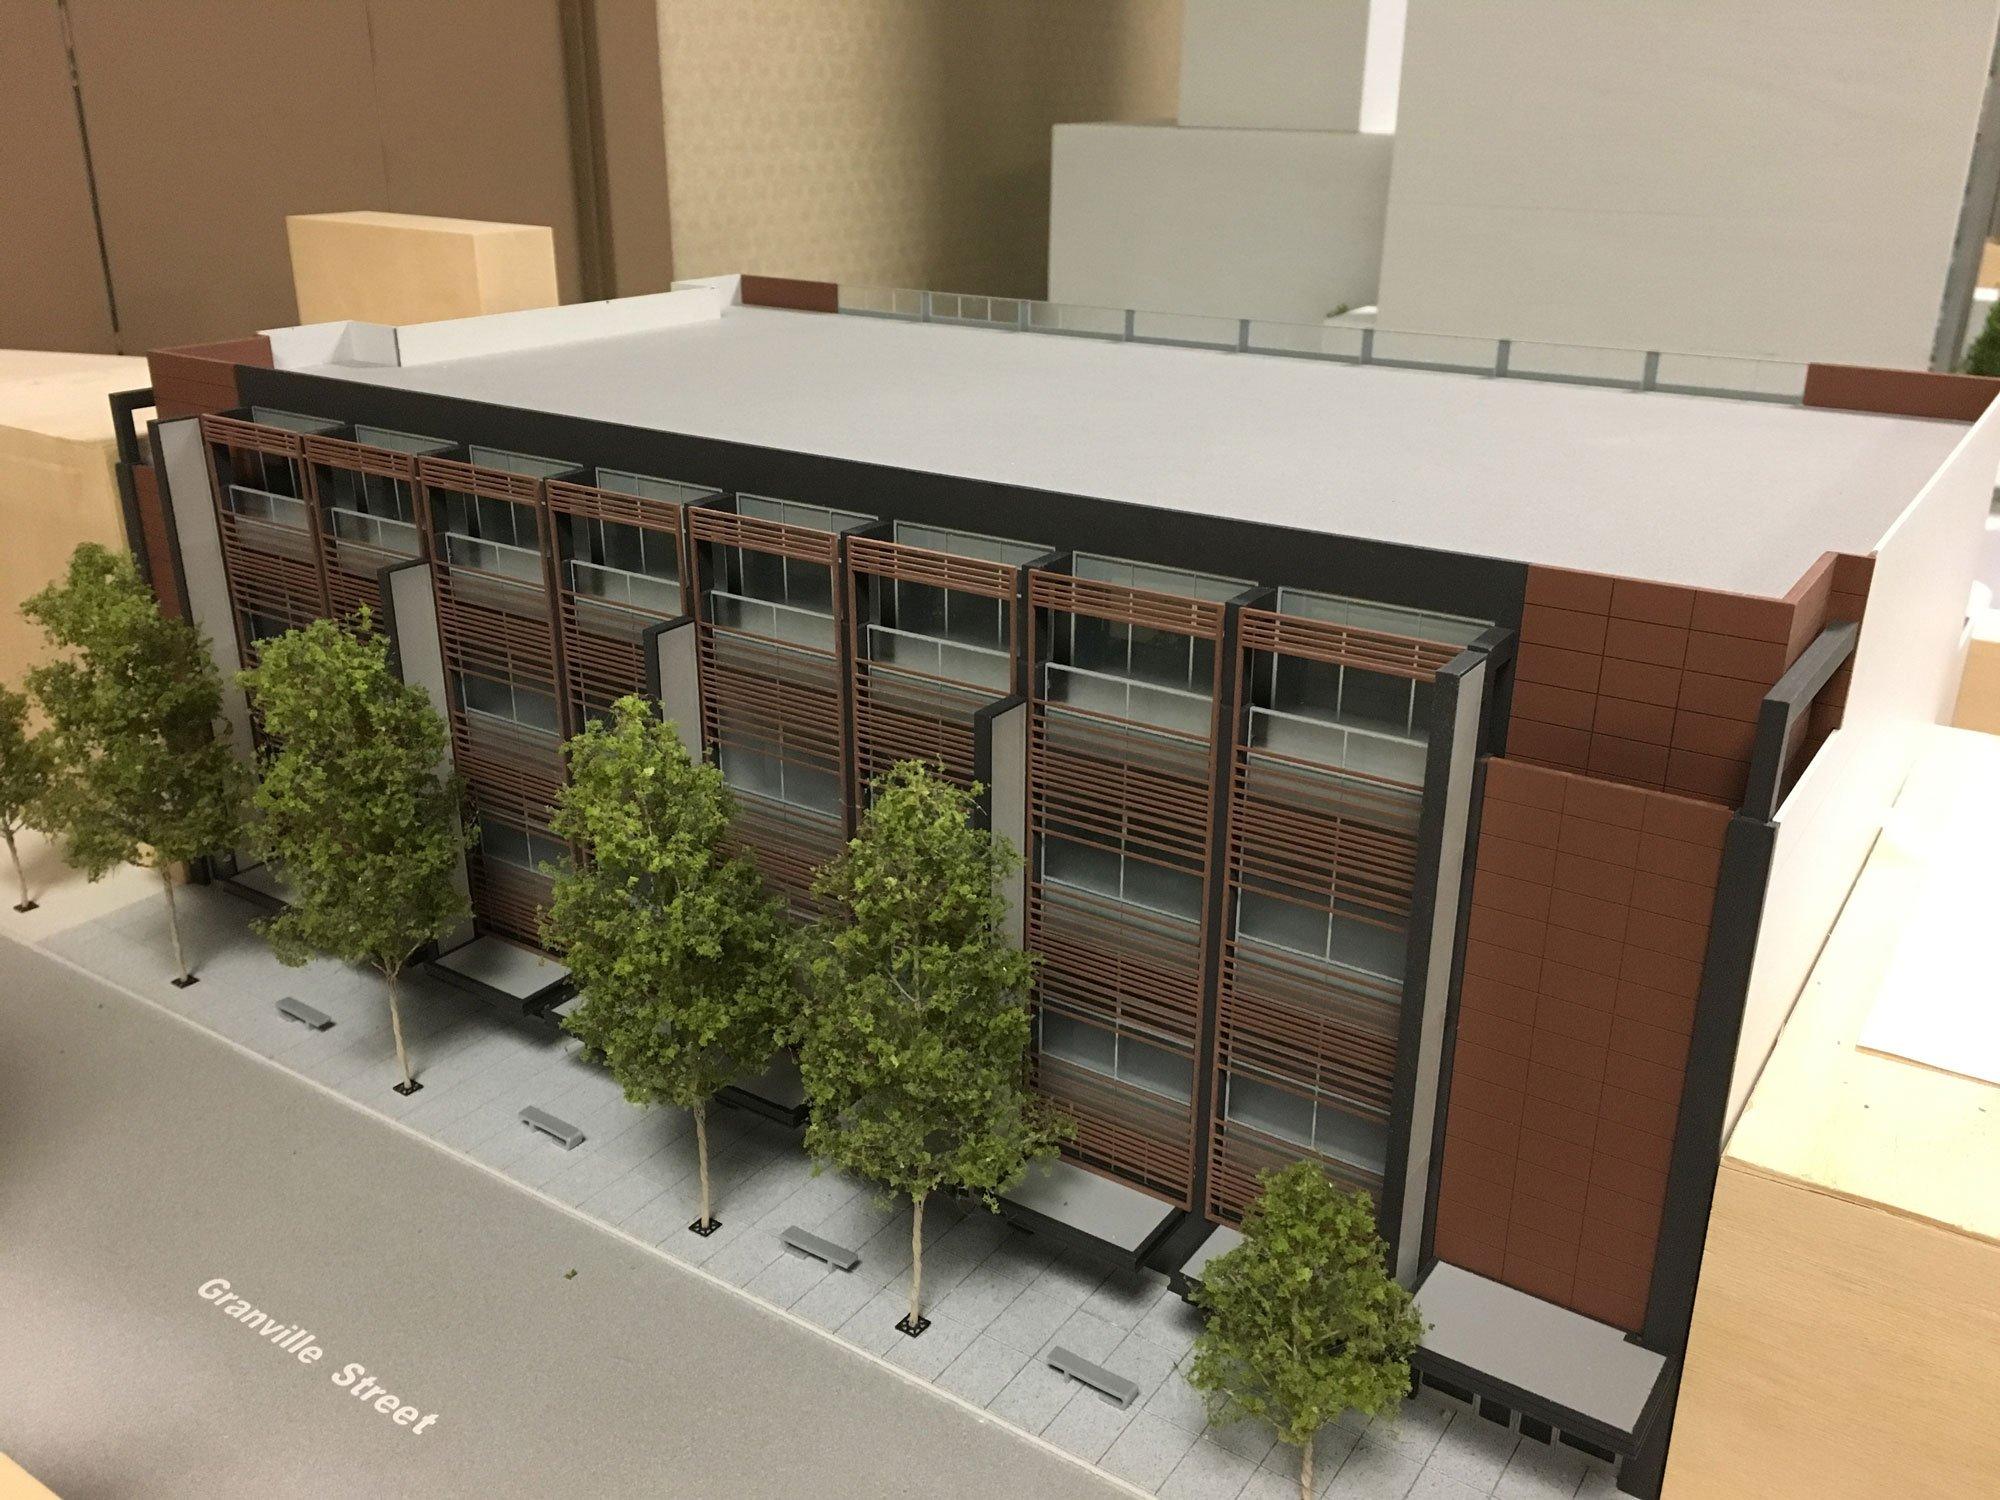 Model of retail building Granville Street